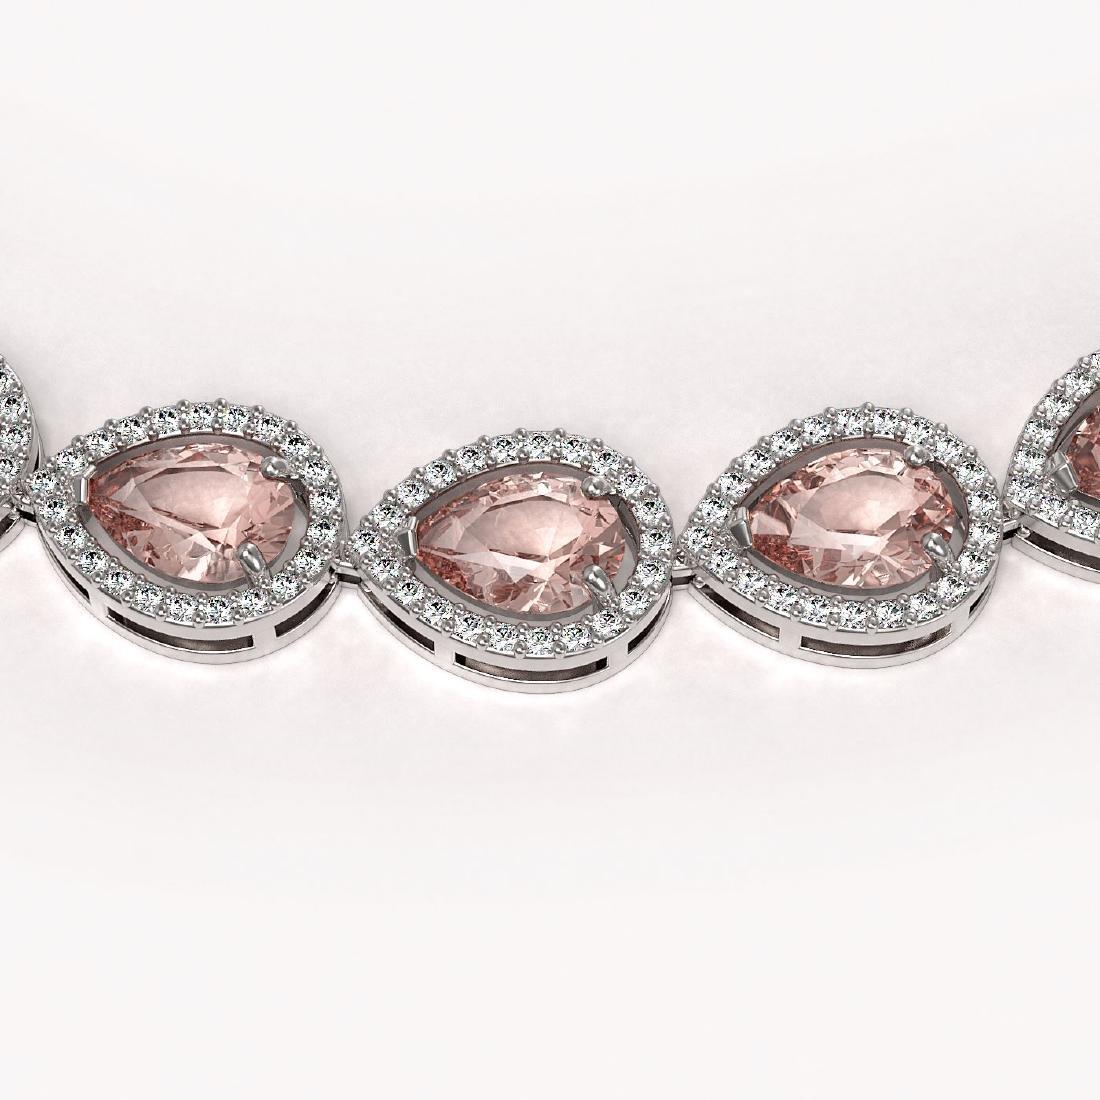 35.13 CTW Morganite & Diamond Halo Necklace 10K White - 3